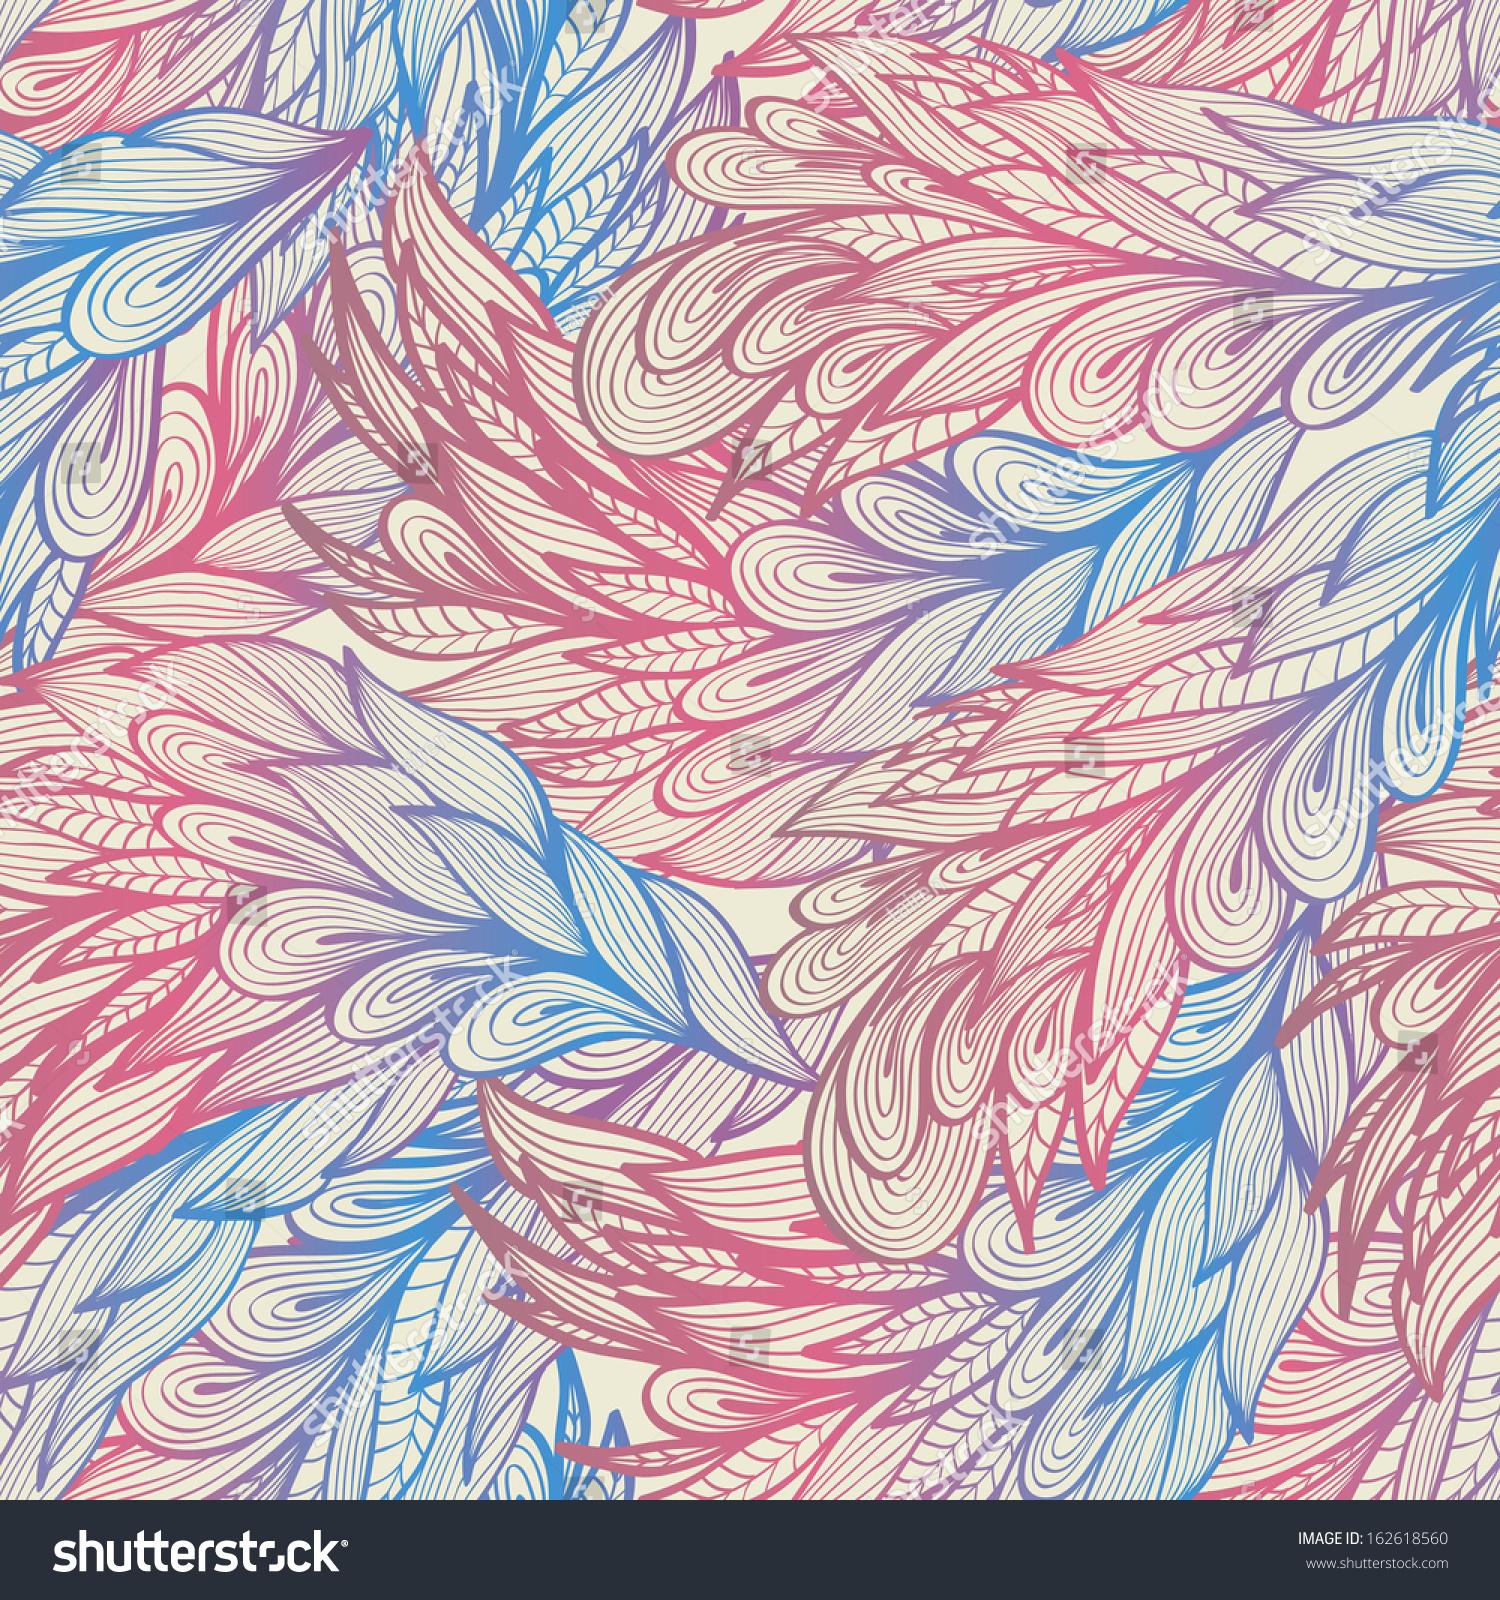 Vintage pastel pattern - photo#19